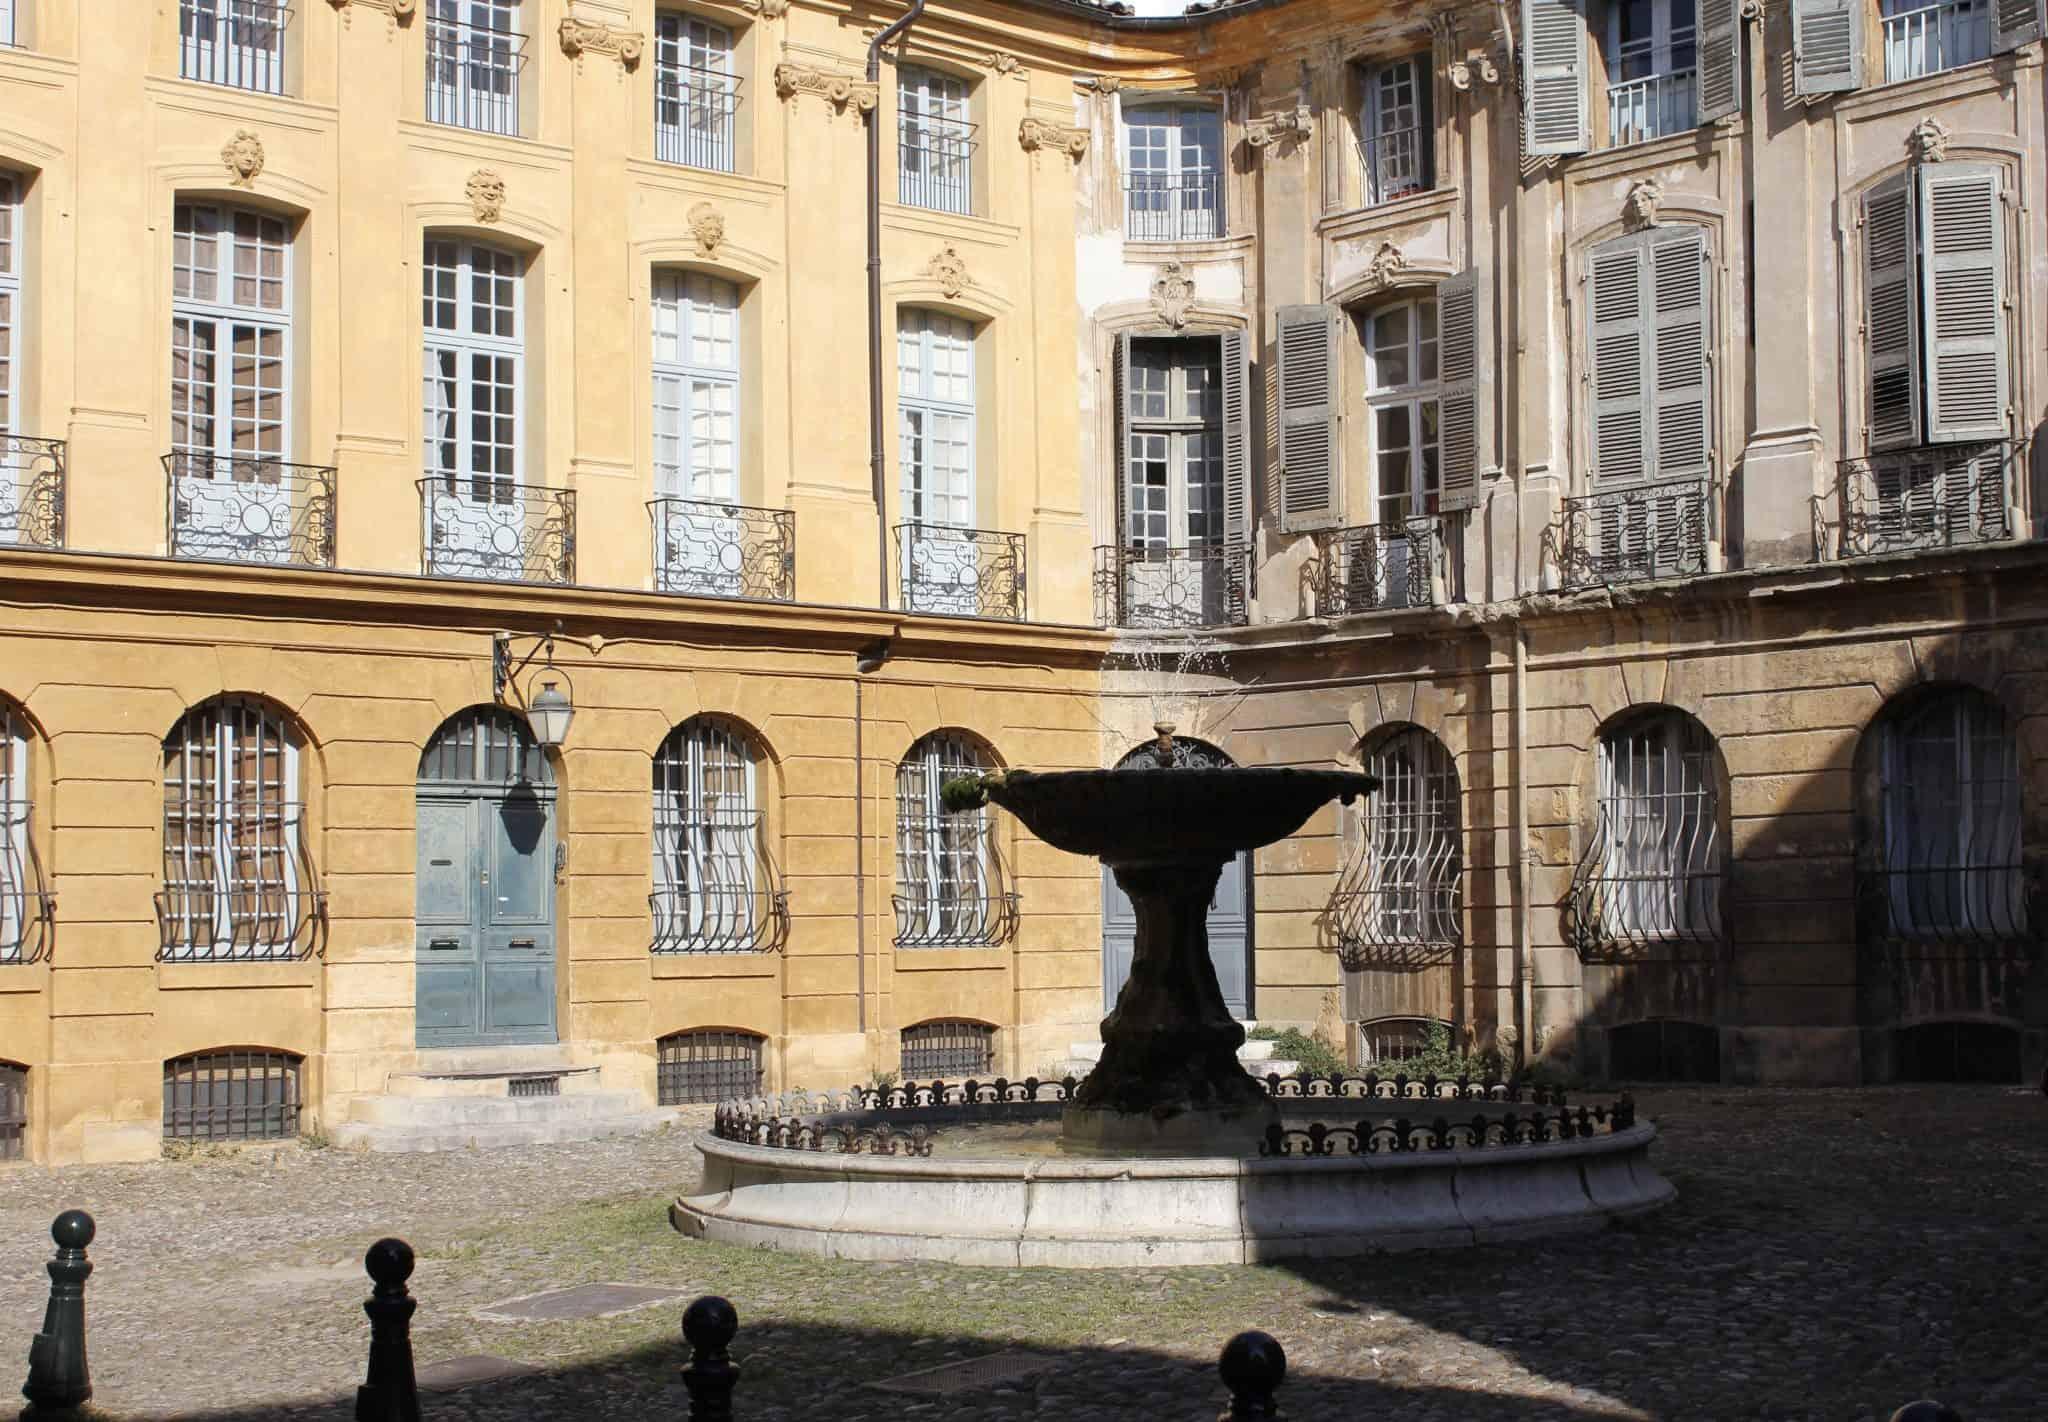 Aix-en-Provence, South of France travel itinerary, 24-36 hours in Aix-en-Provence itinerary, things to do in Aix-en-Provence, day trips from Aix-en-Provence